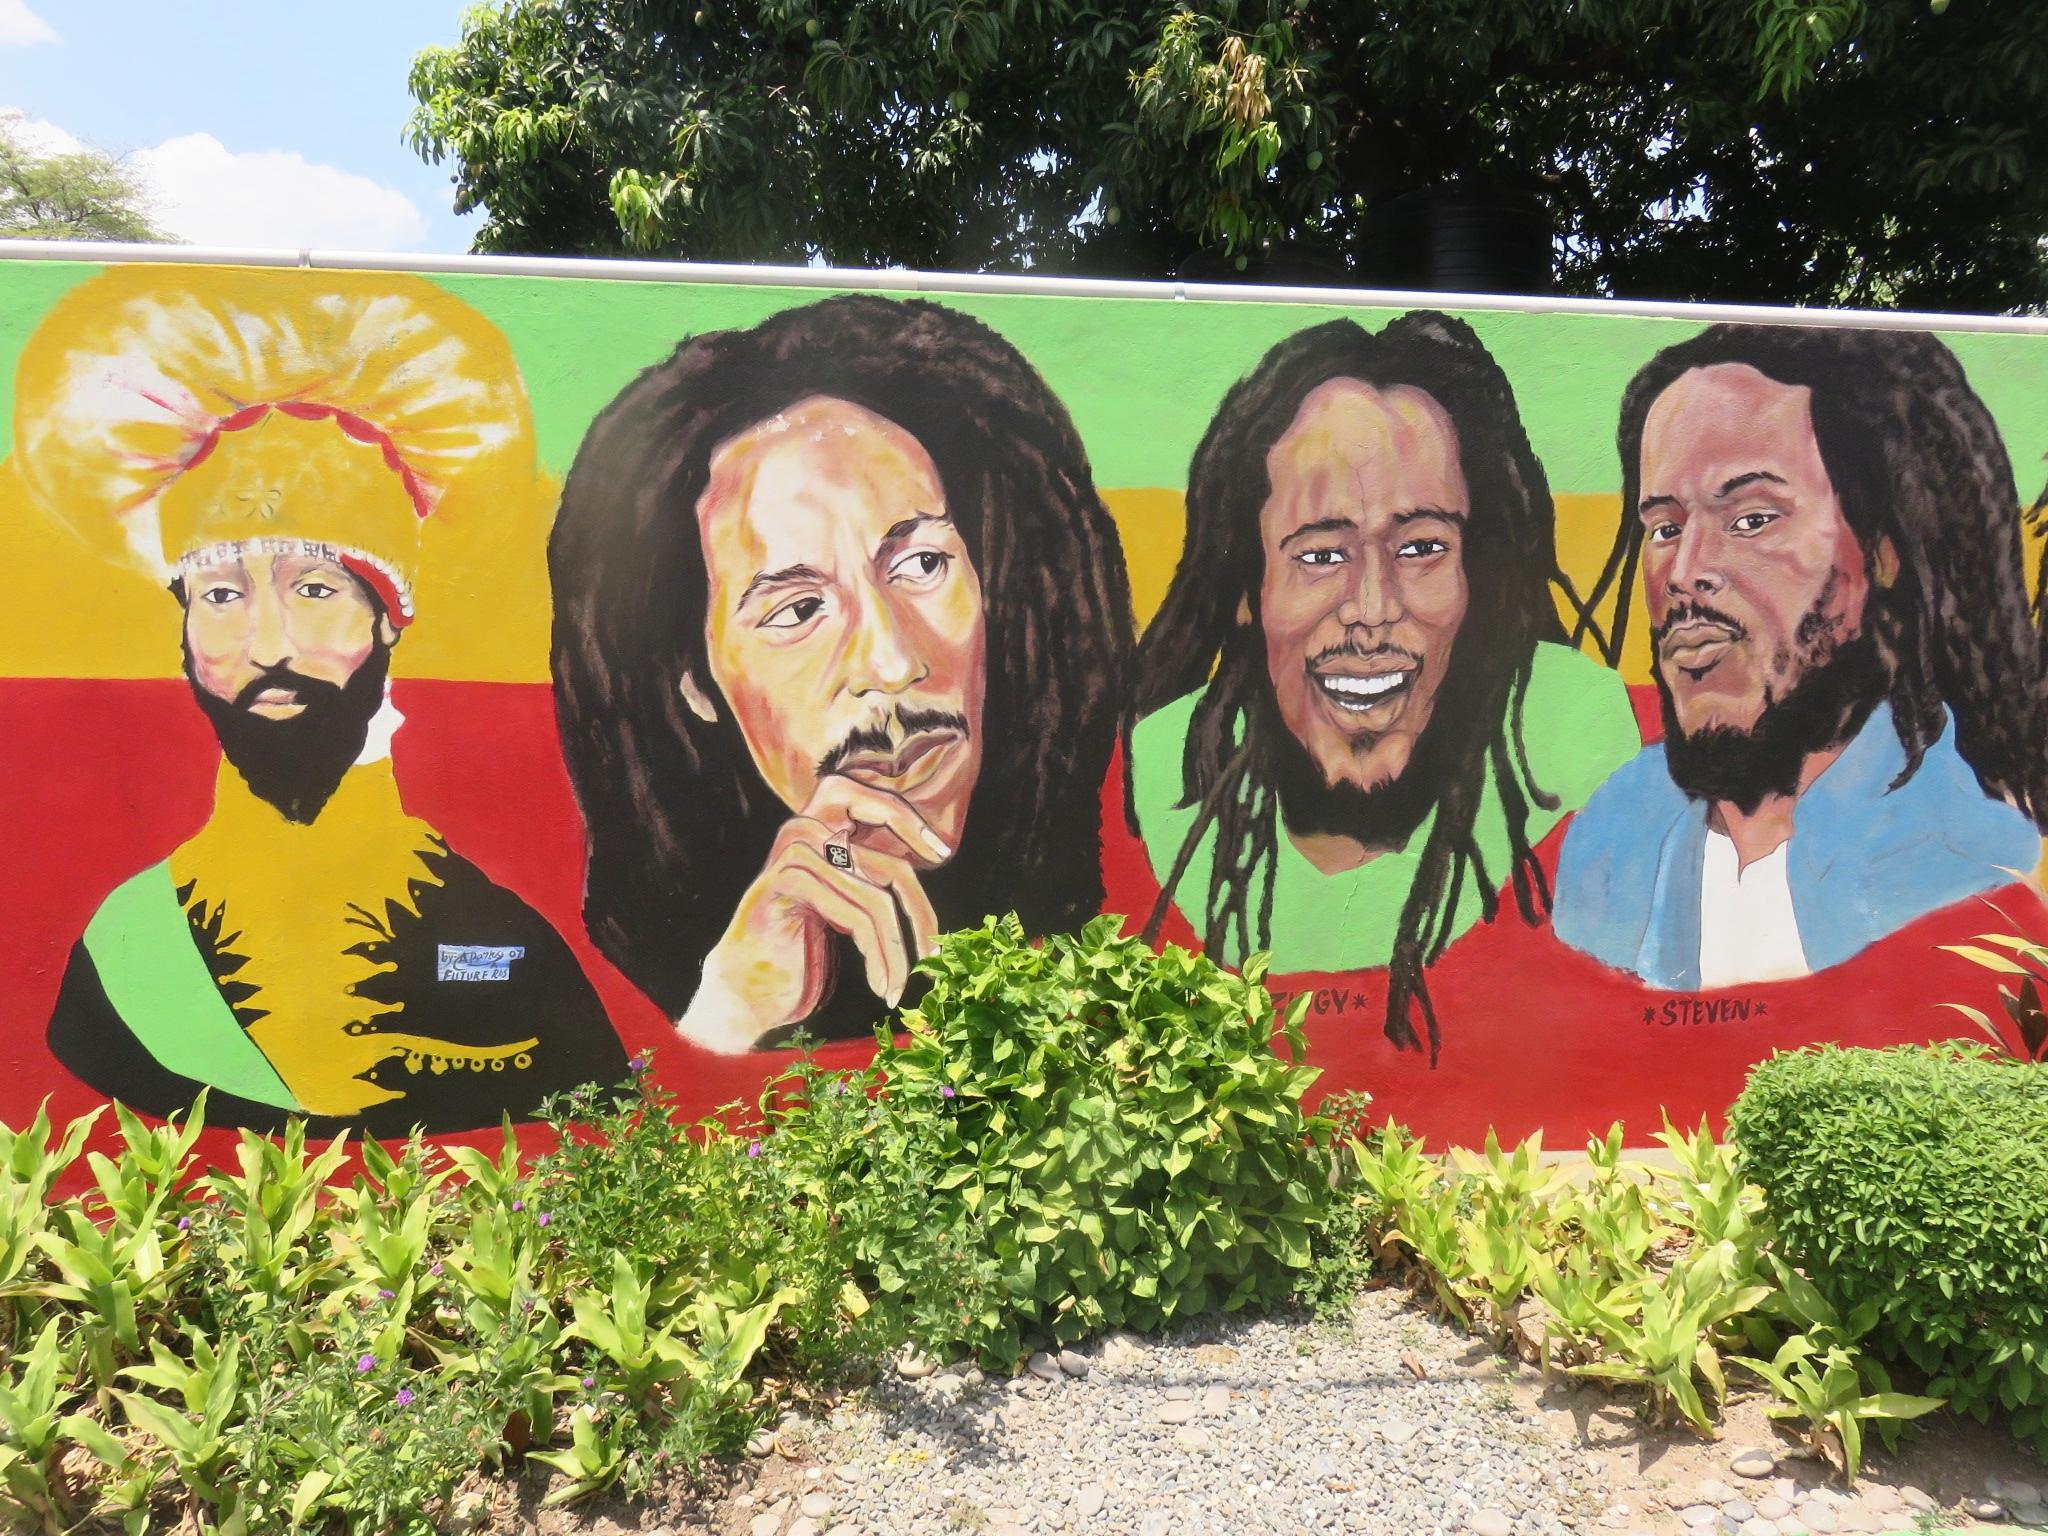 soltesz_bela_jamaica_035.jpg